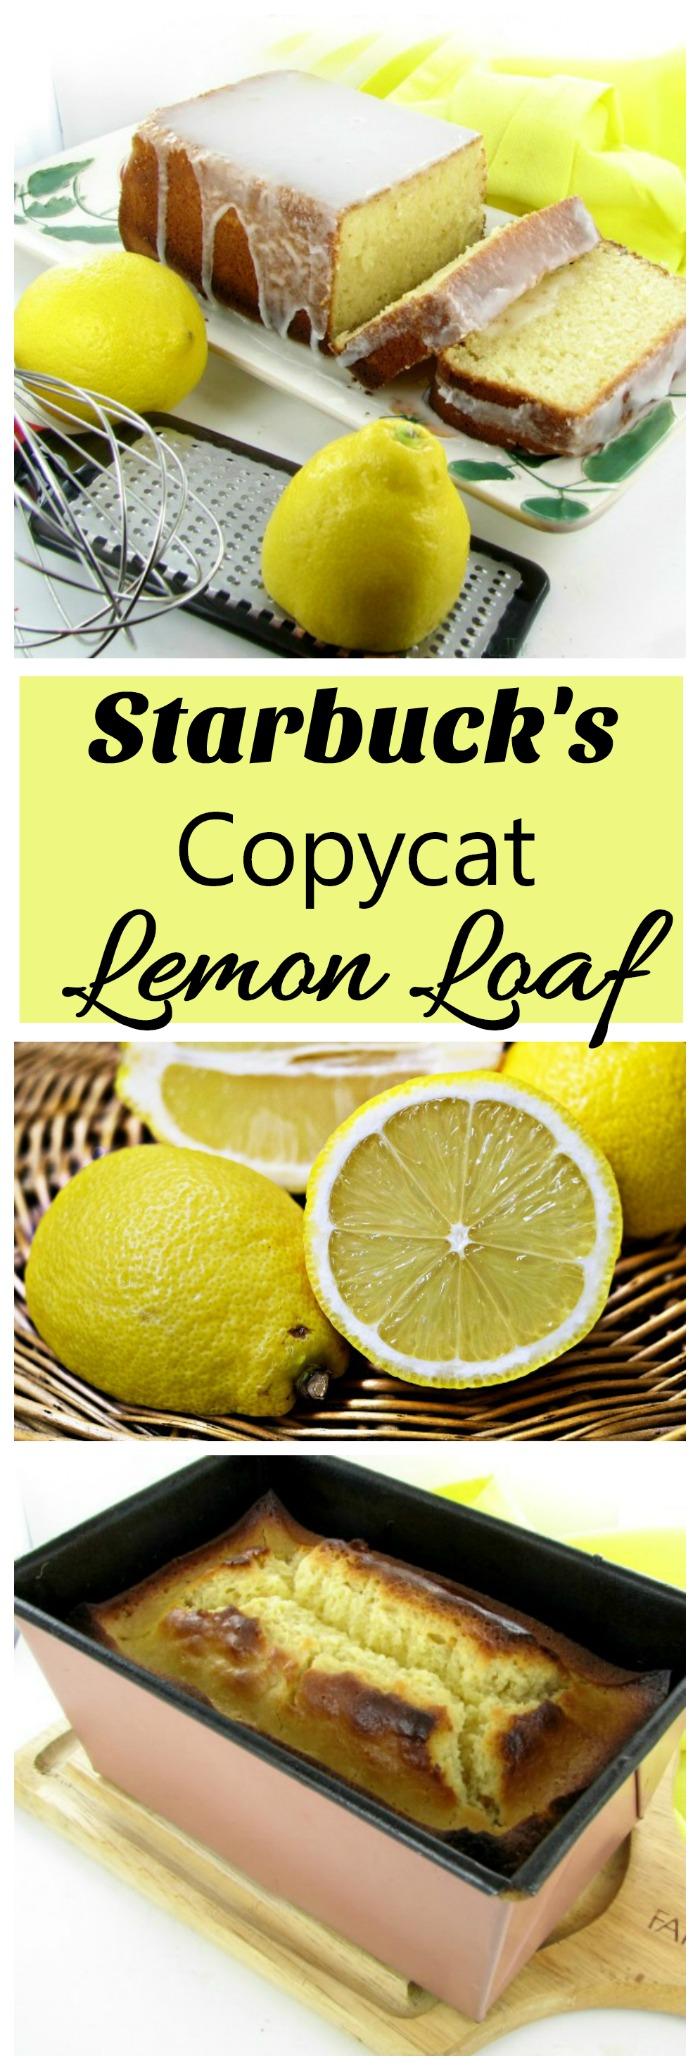 Copycat Recipe: Starbucks Lemon Loaf